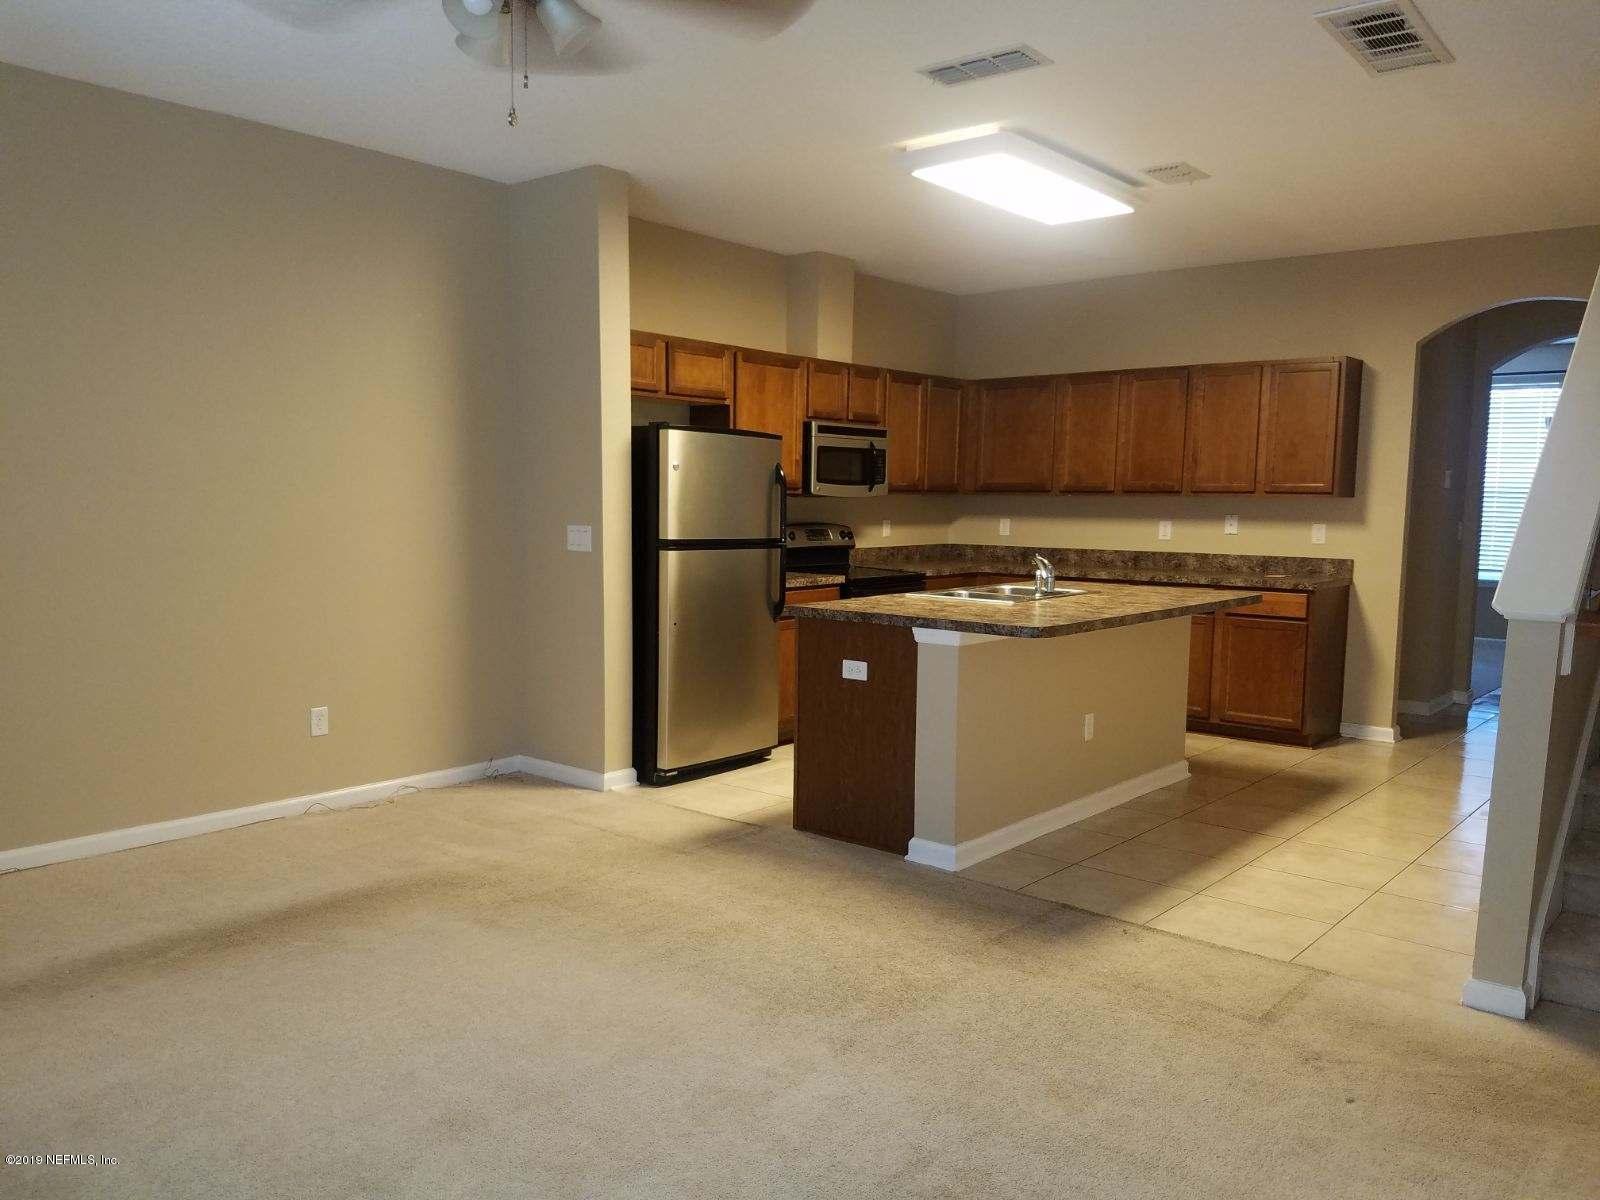 625 OAKLEAF PLANTATION, ORANGE PARK, FLORIDA 32065, 3 Bedrooms Bedrooms, ,2 BathroomsBathrooms,Condo,For sale,OAKLEAF PLANTATION,1011053